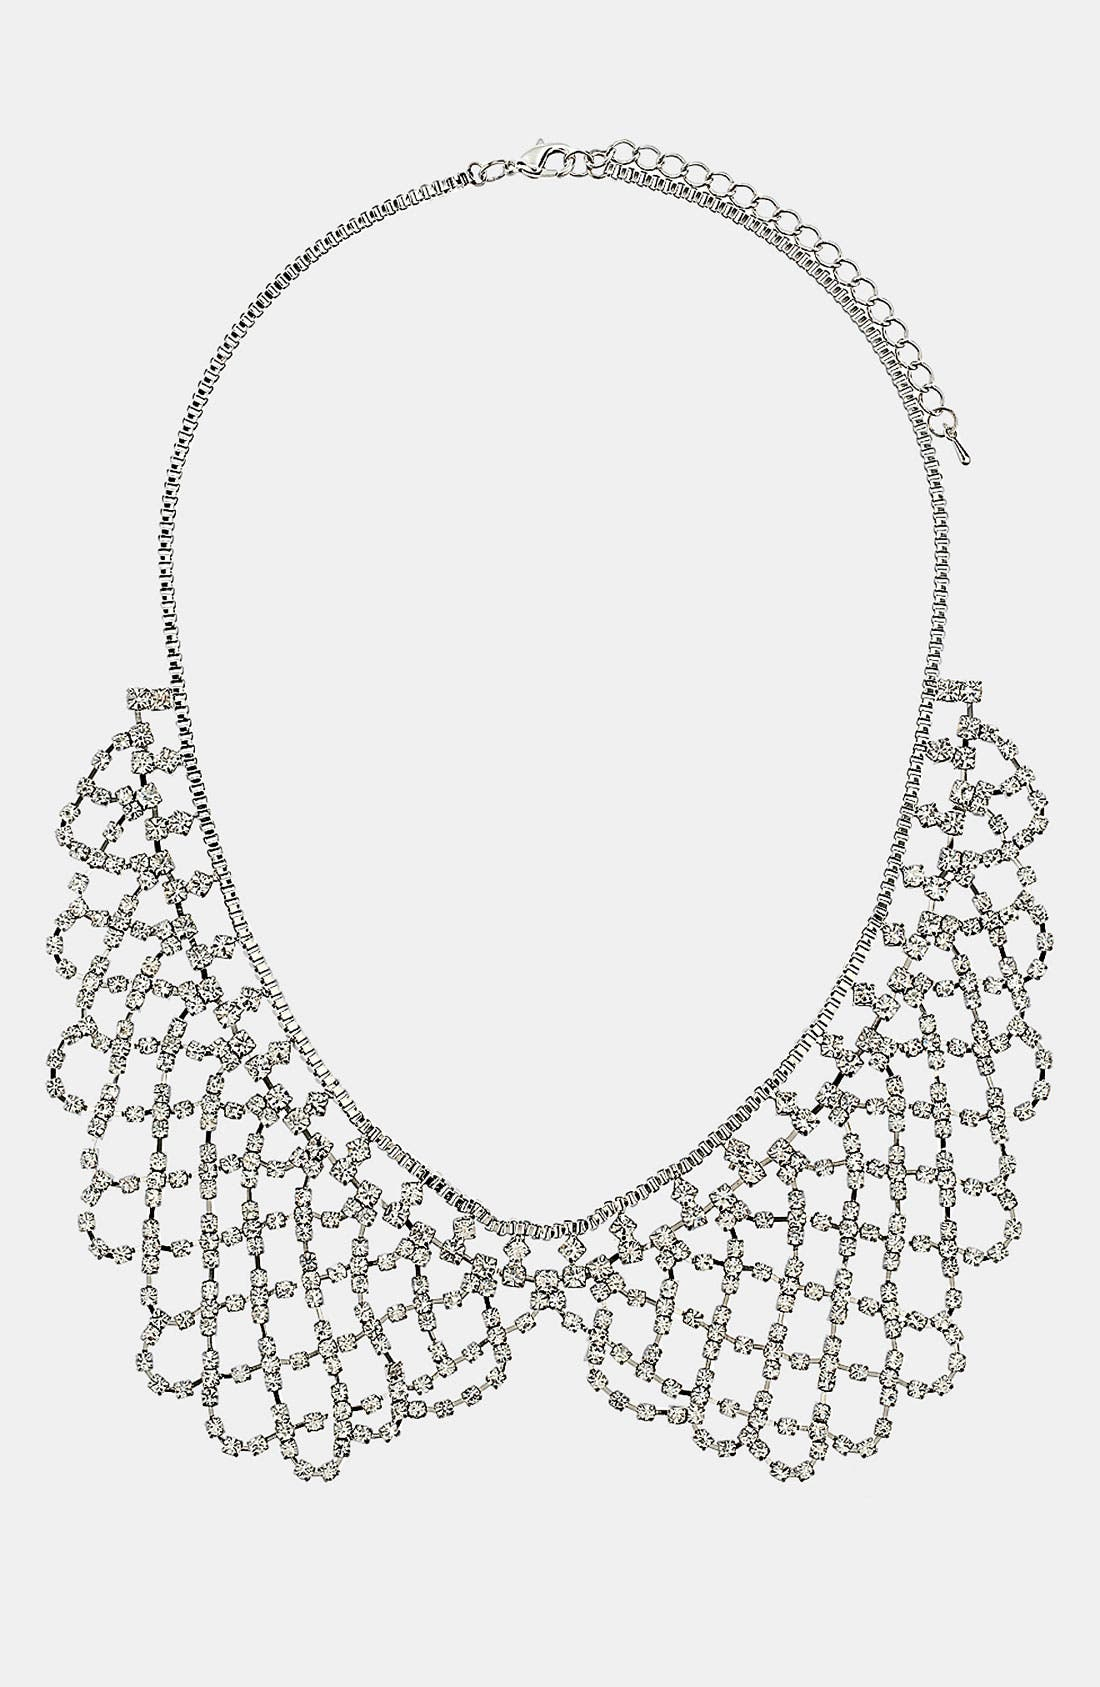 Alternate Image 1 Selected - Topshop Rhinestone Peter Pan Collar Necklace